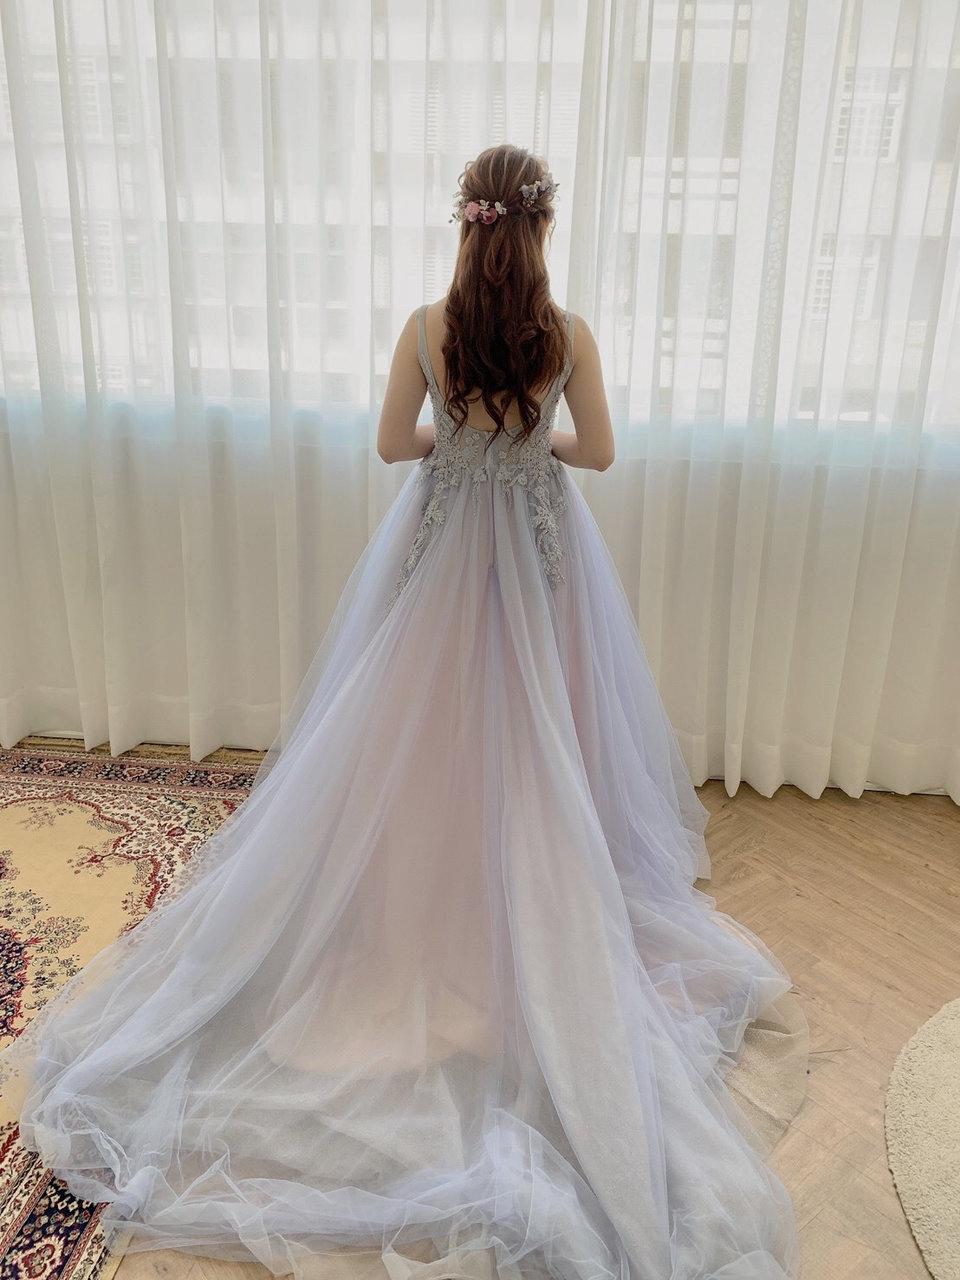 J2 wedding 中壢 手工訂製婚紗,謝謝J2 Wedding中壢店,讓每一張婚紗照都是幸福滿滿